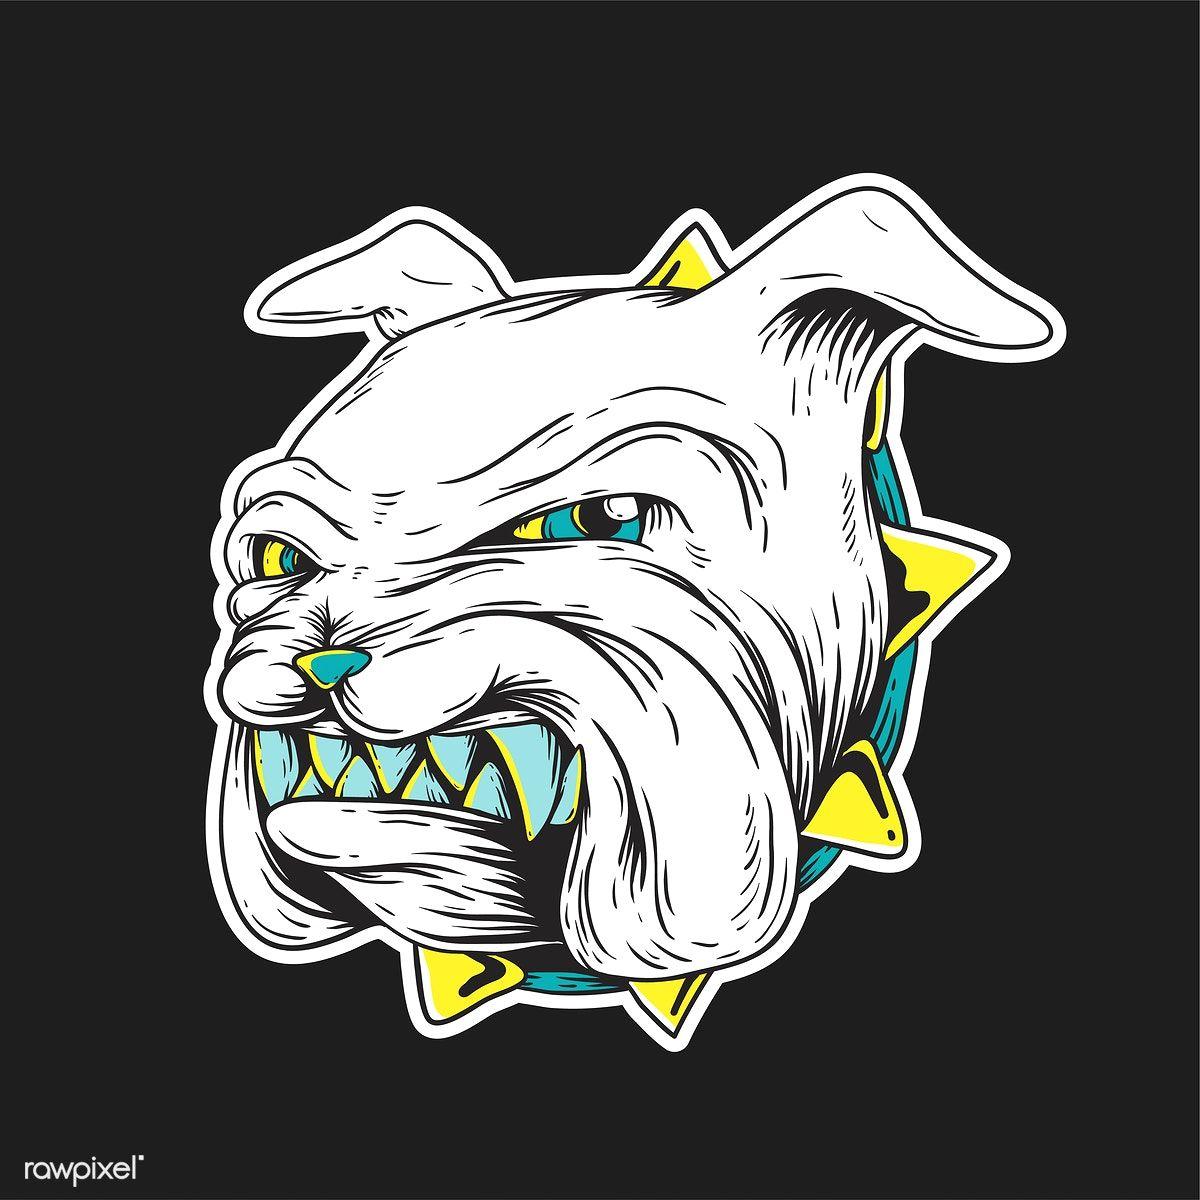 Growling Bulldog Vector Get This Creative Vector At Www Rawpixel Com Dog Vector Free Vector Illustration Vector Free